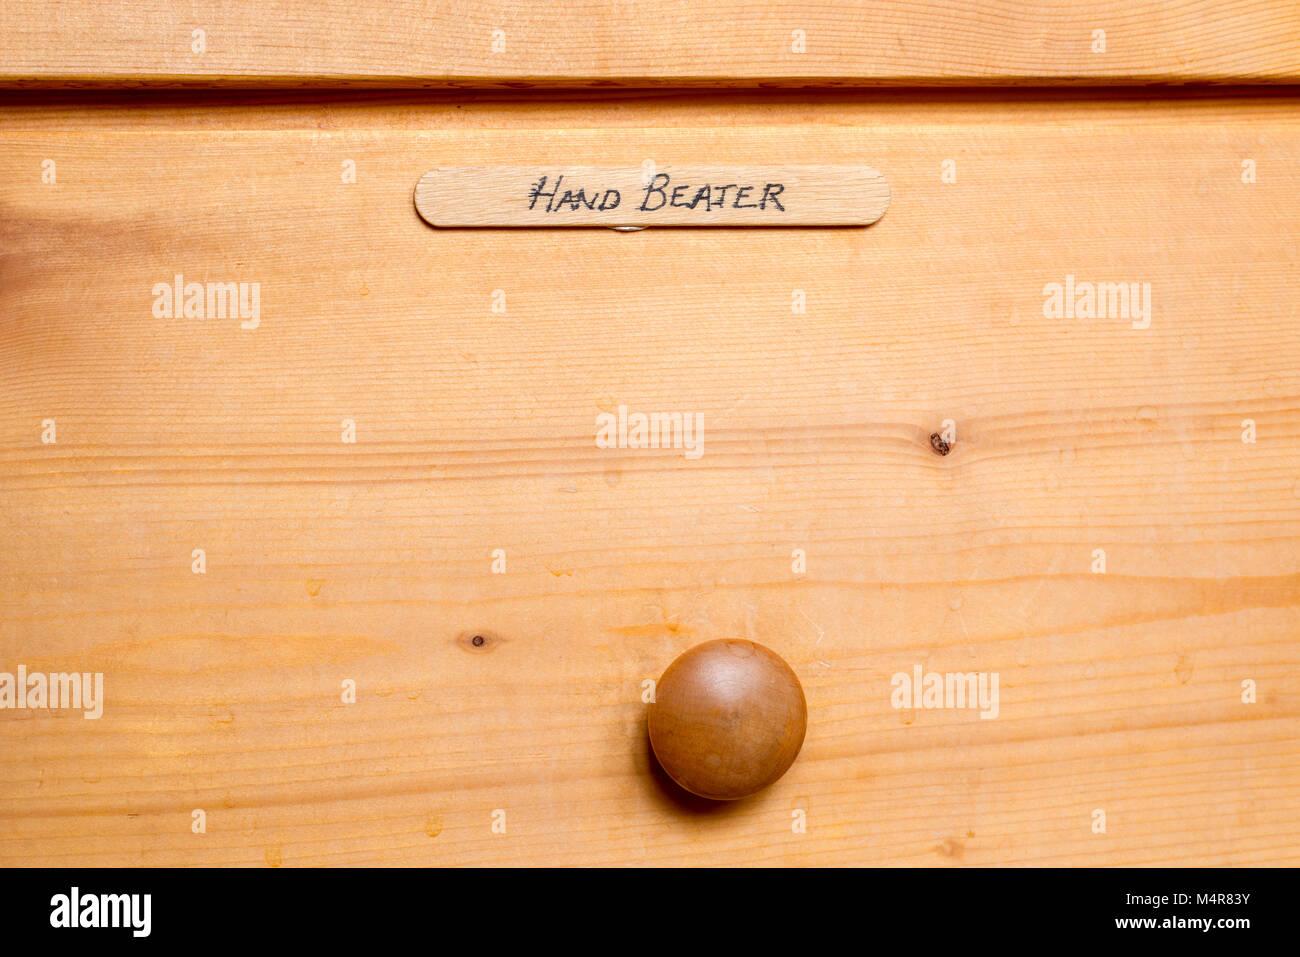 Kitchen drawer with tounge depressor label. - Stock Image